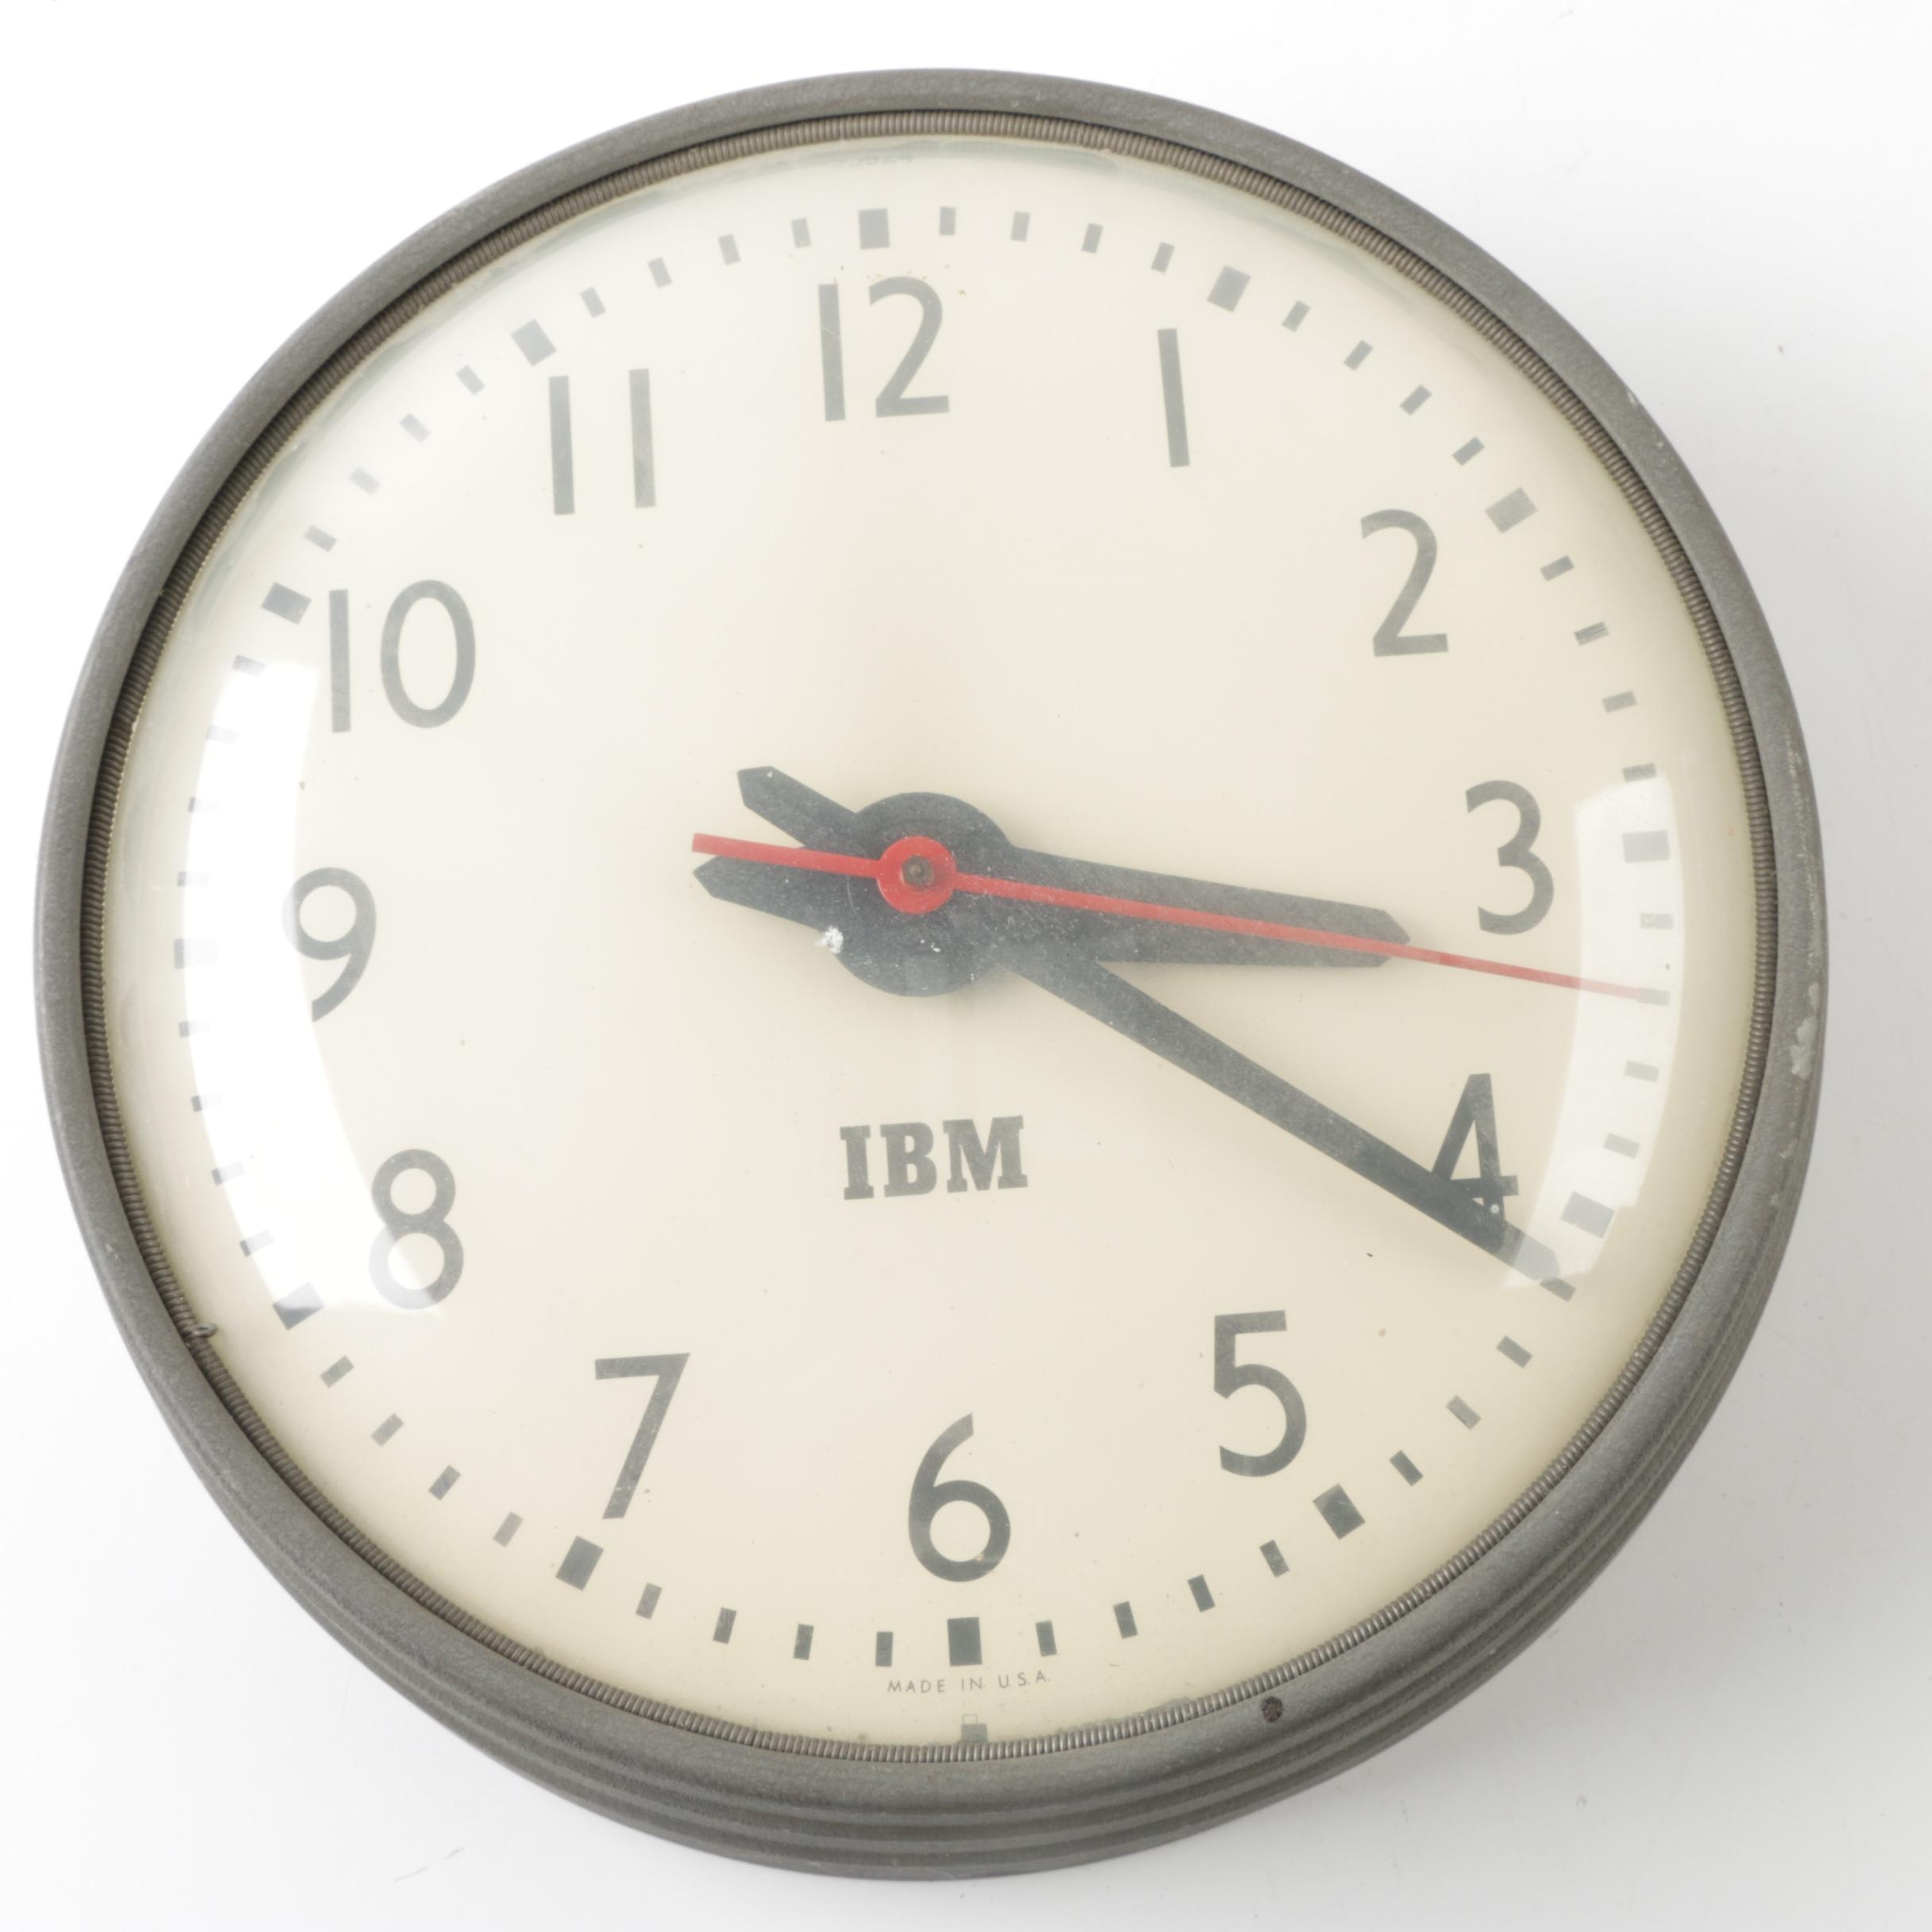 Vintage IBM Wall Clock